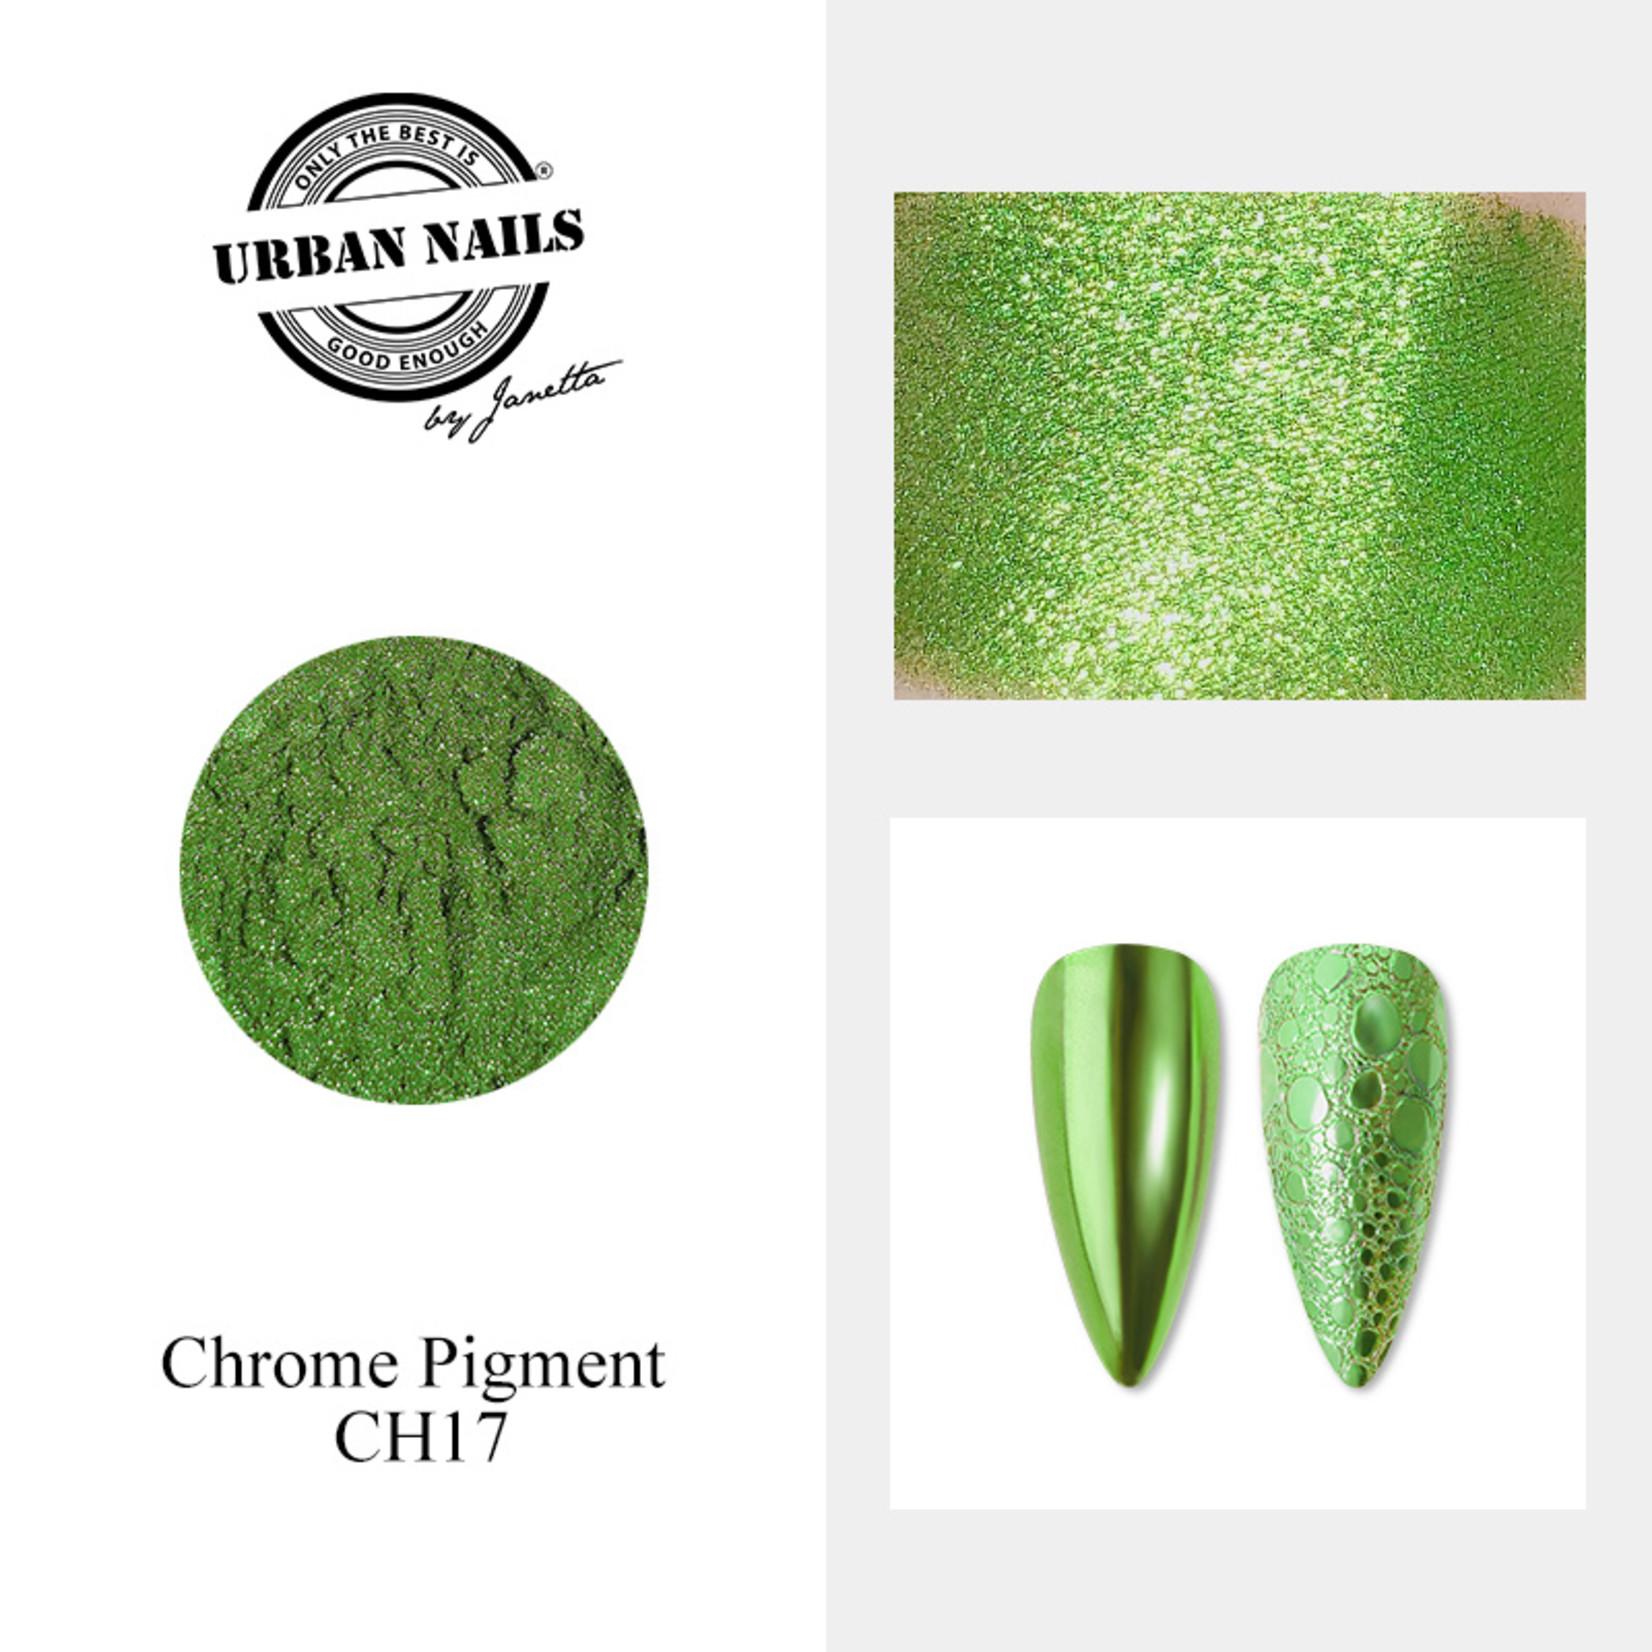 Urban Nails Chrome pigment 17 Fel Groen